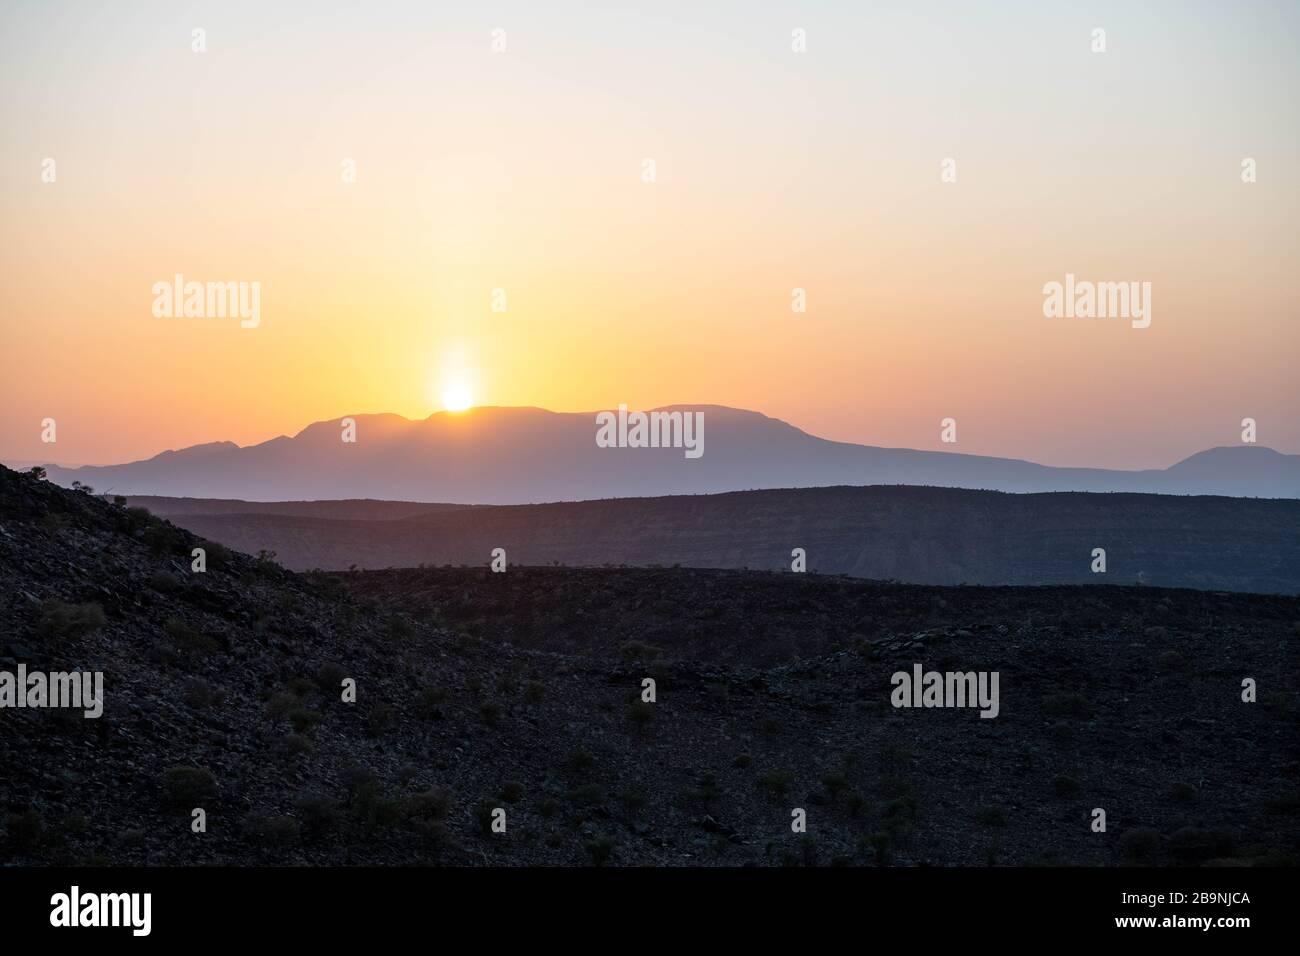 Africa, Djibouti, Abourma. Aburma's desert at sunset Stock Photo